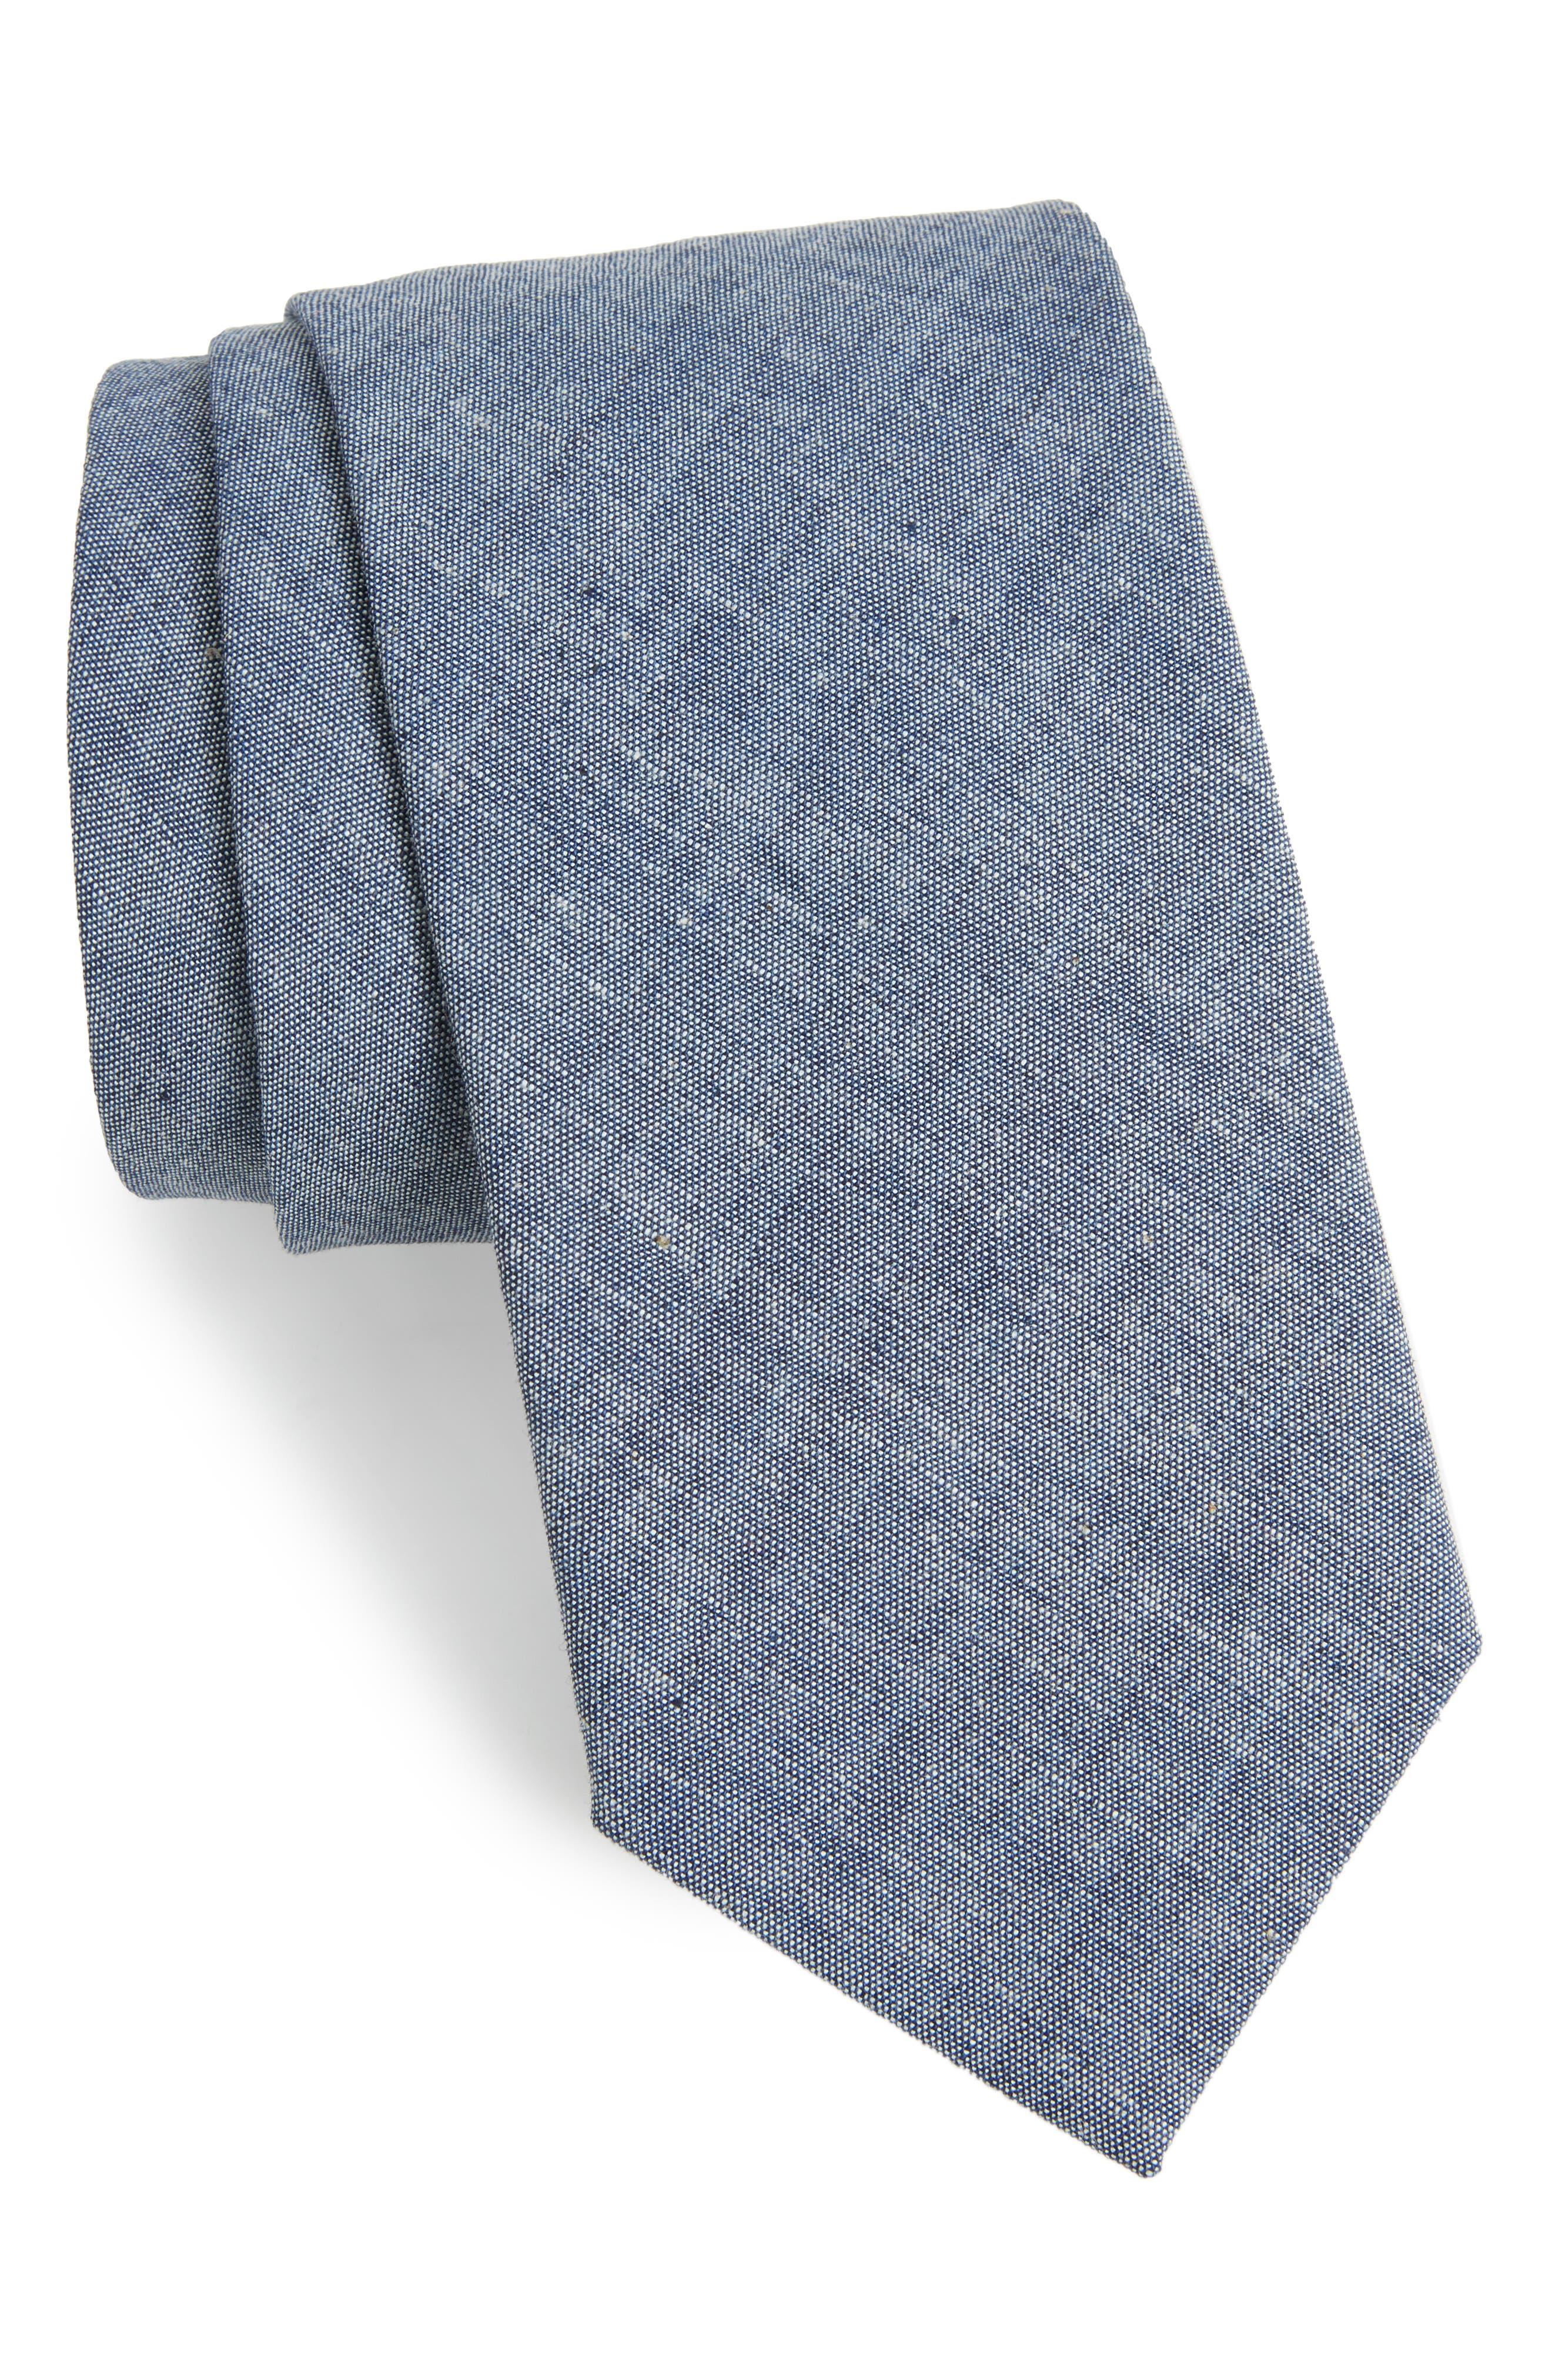 Chambray Cotton Tie,                             Main thumbnail 1, color,                             CHAMBRAY